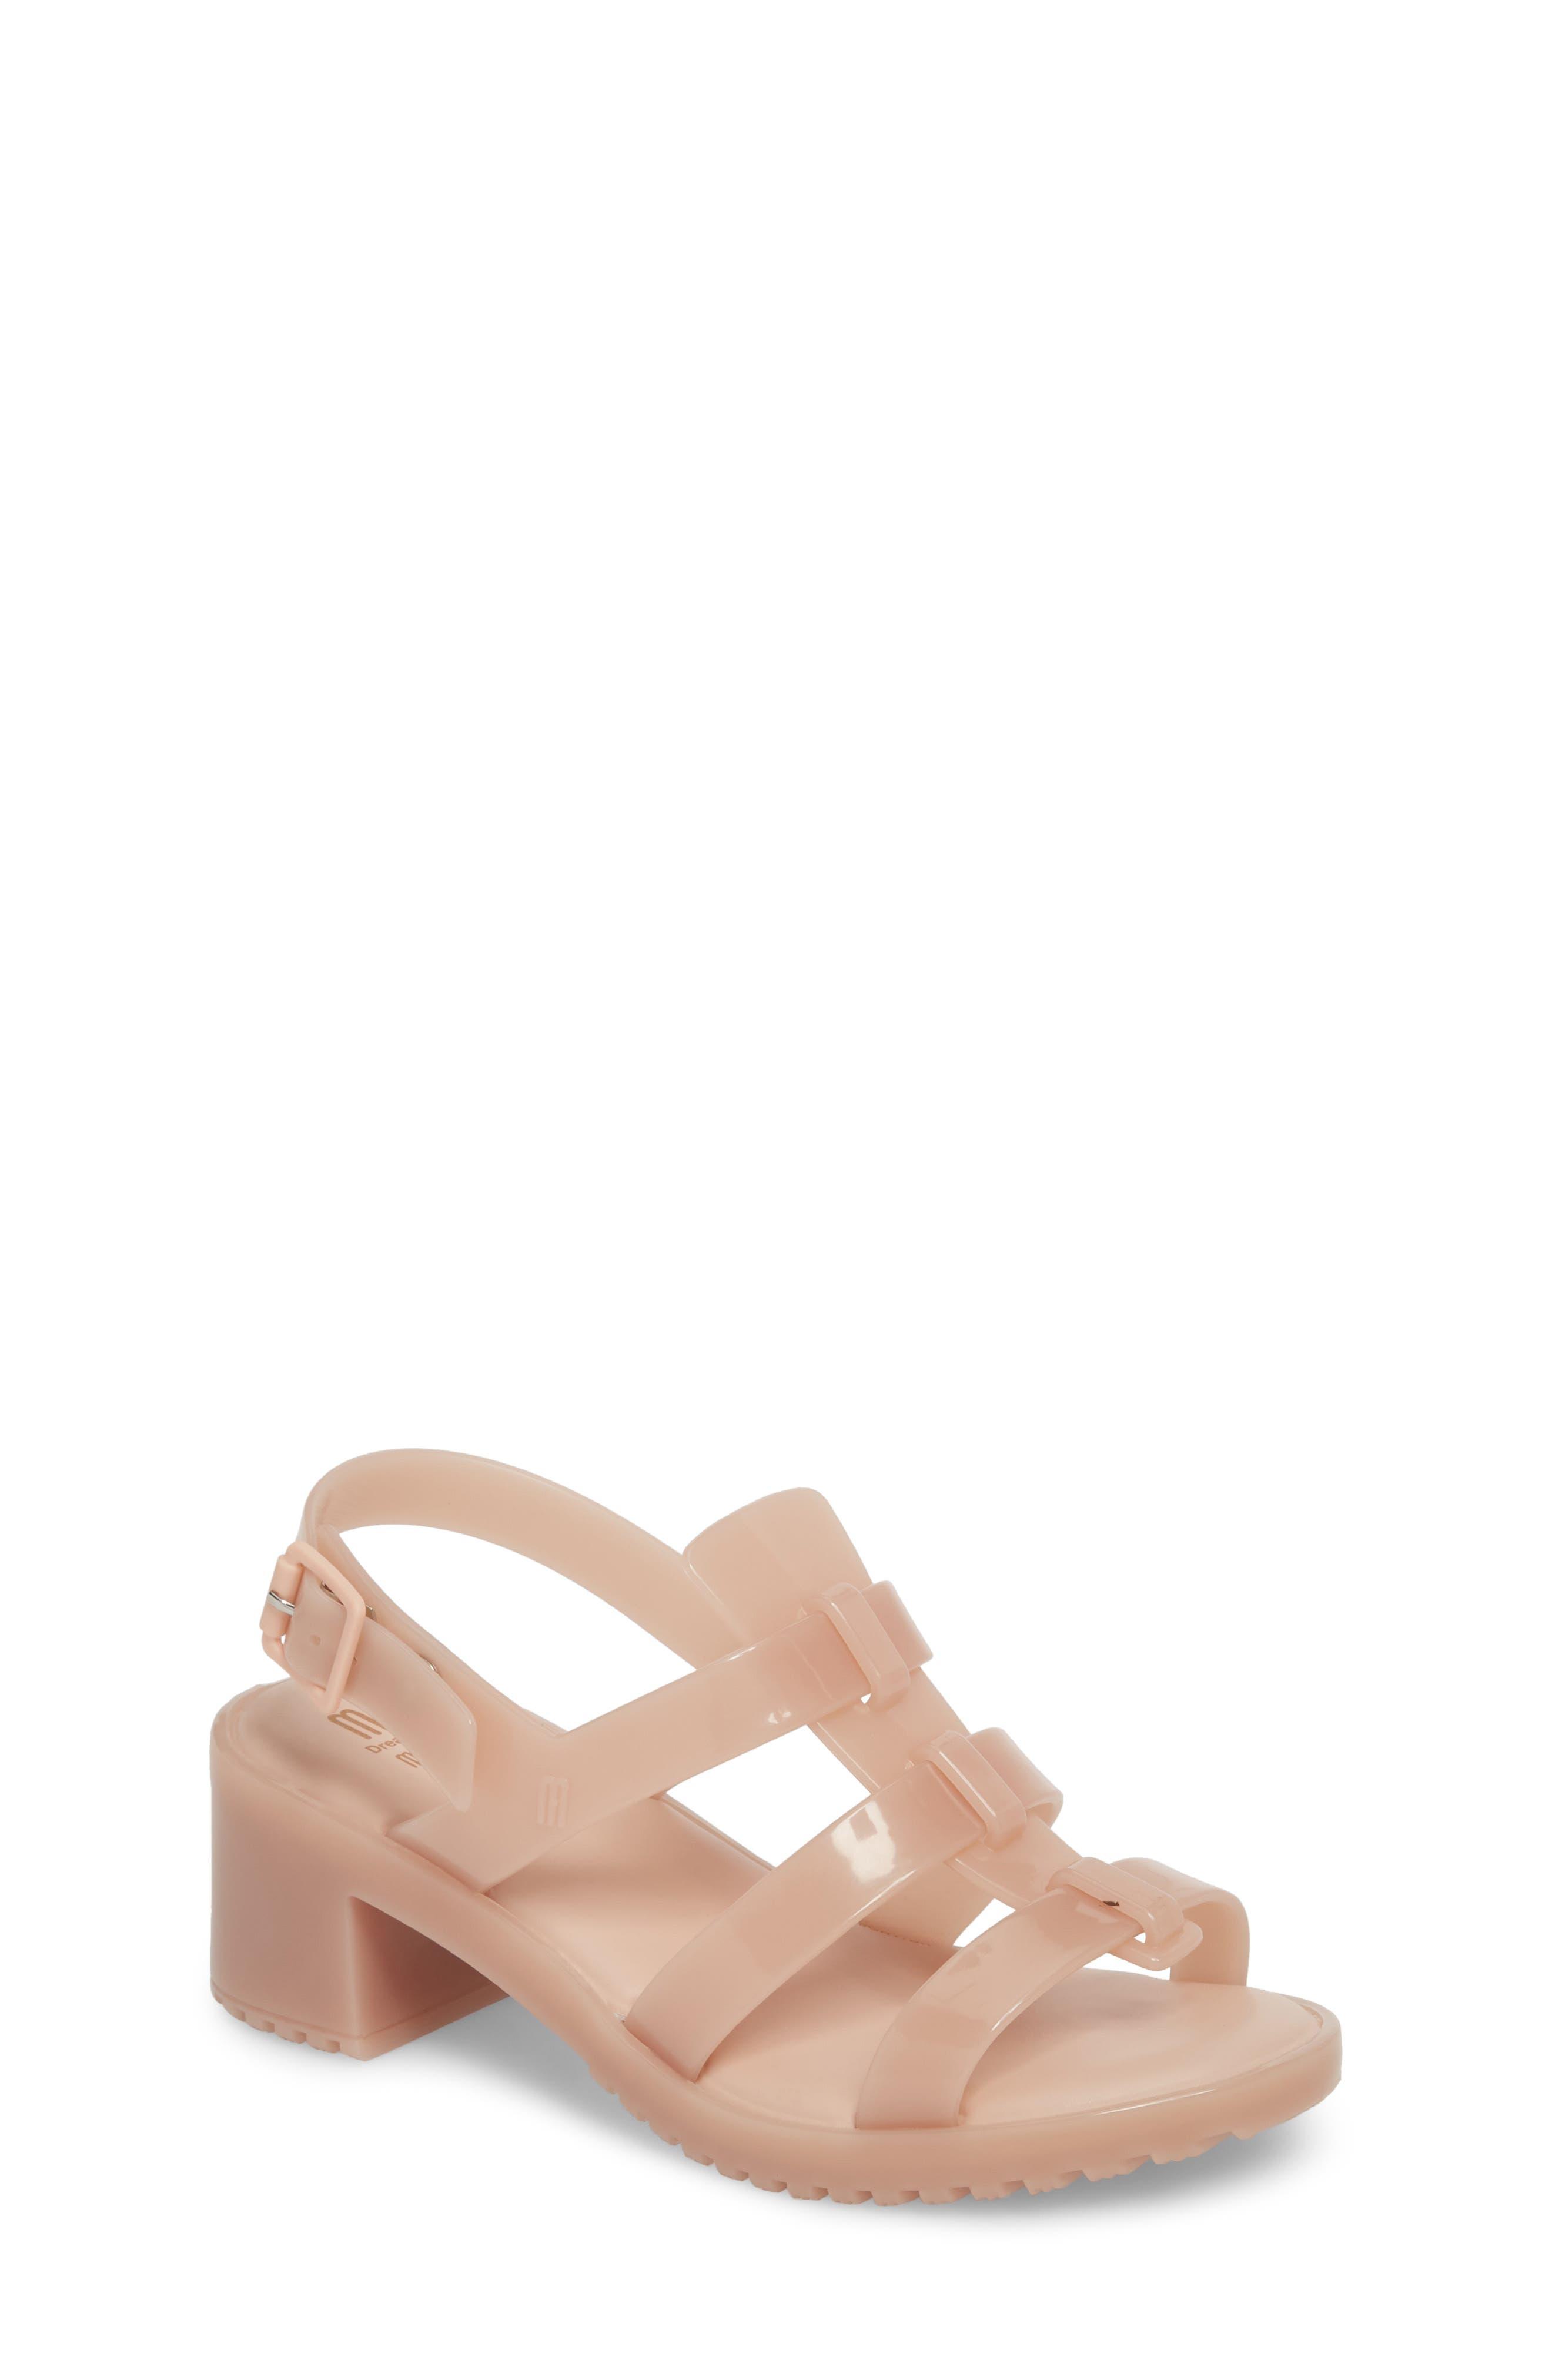 'Flox' Sandal,                             Main thumbnail 1, color,                             Light Pink Matte